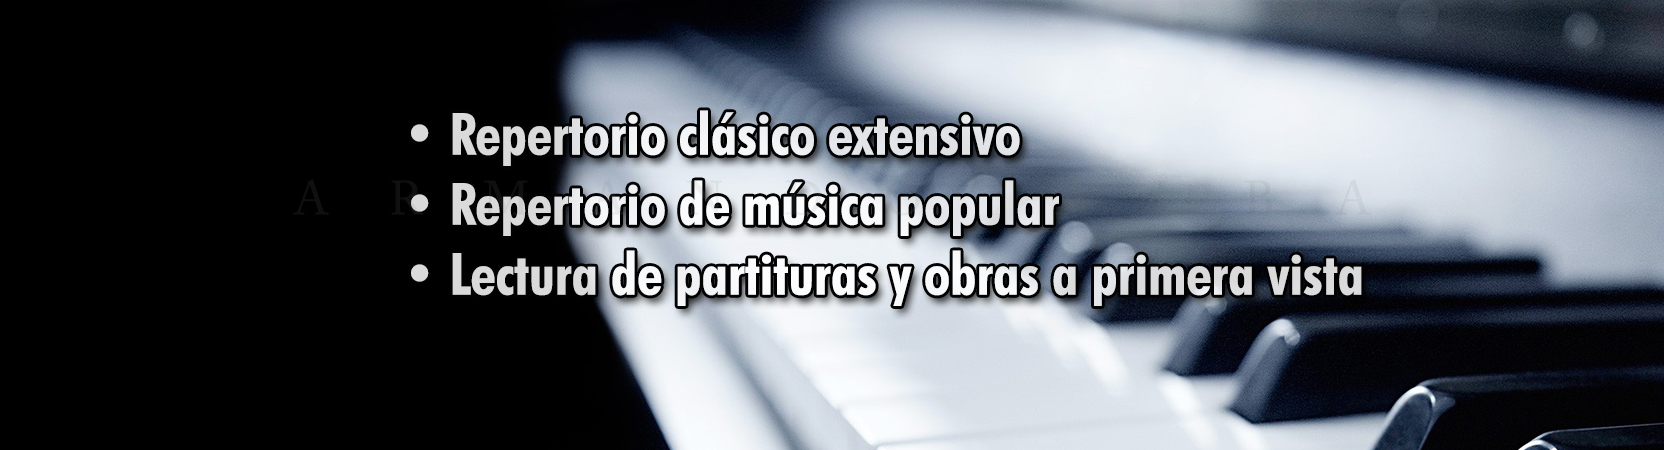 Imagen_para_página_Wix_-_piano_01-1_(1664x450px)